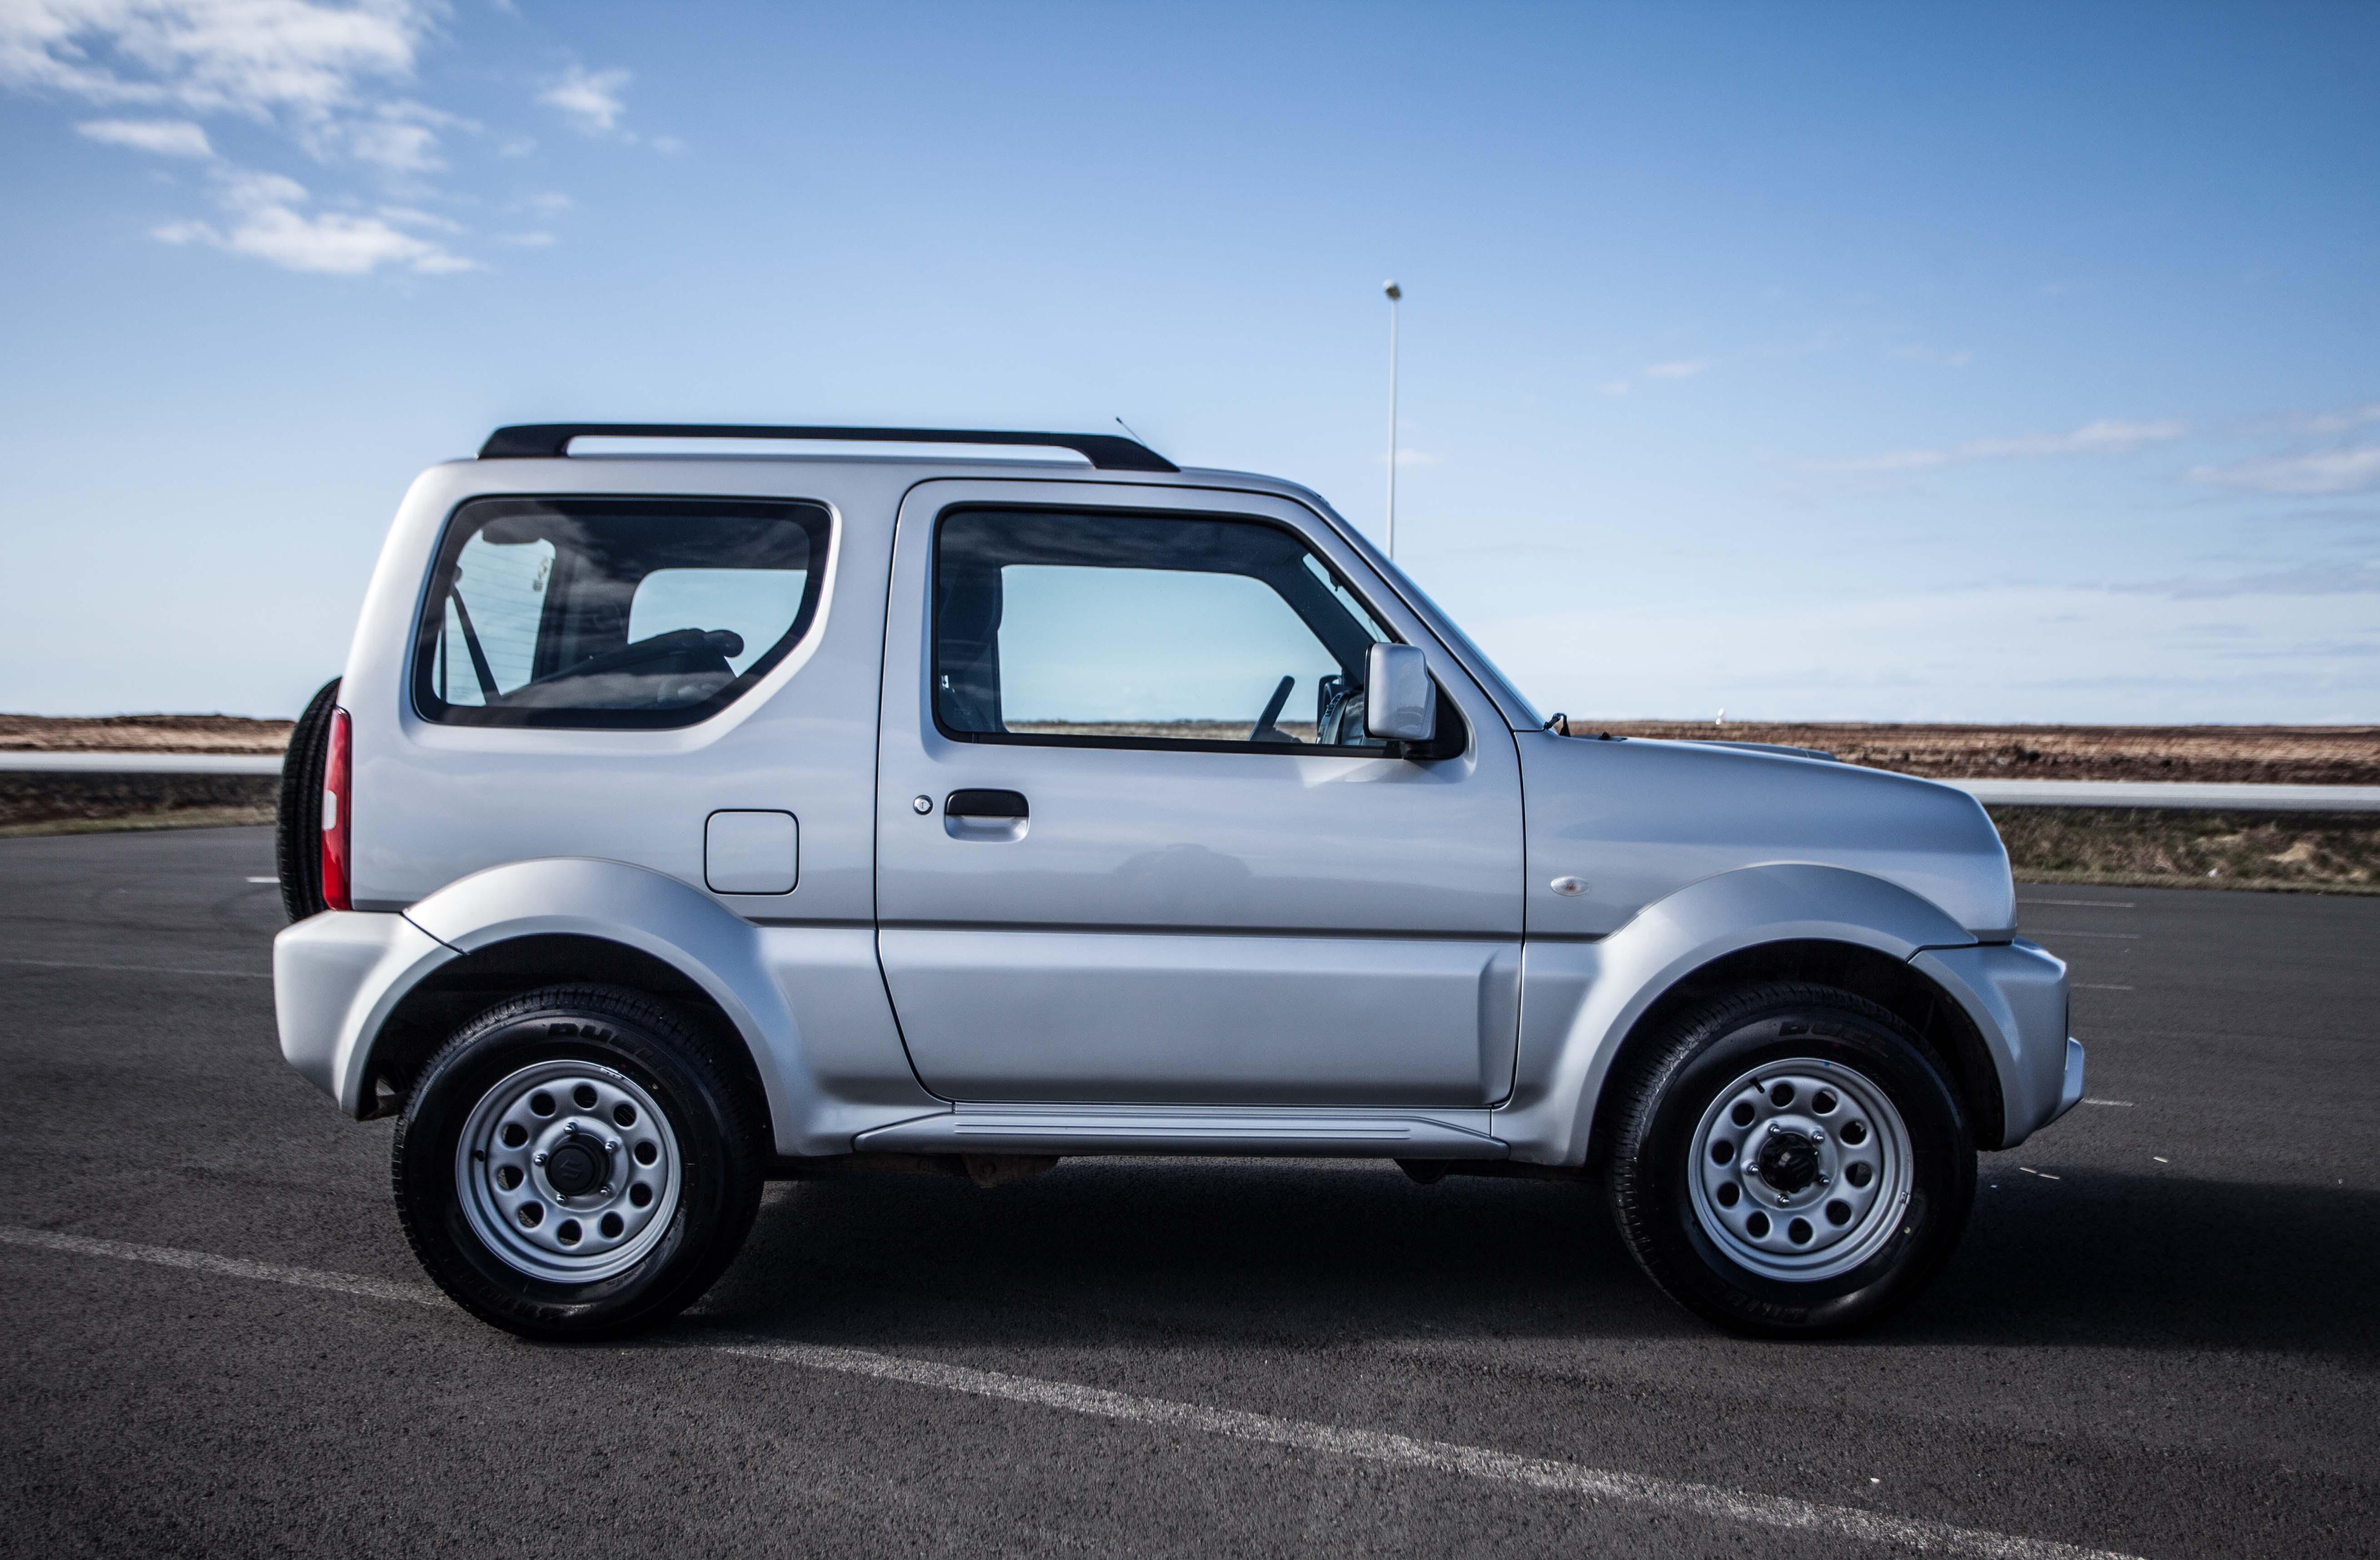 Rent a cheap 4x4 in Iceland - Suzuki Jimny